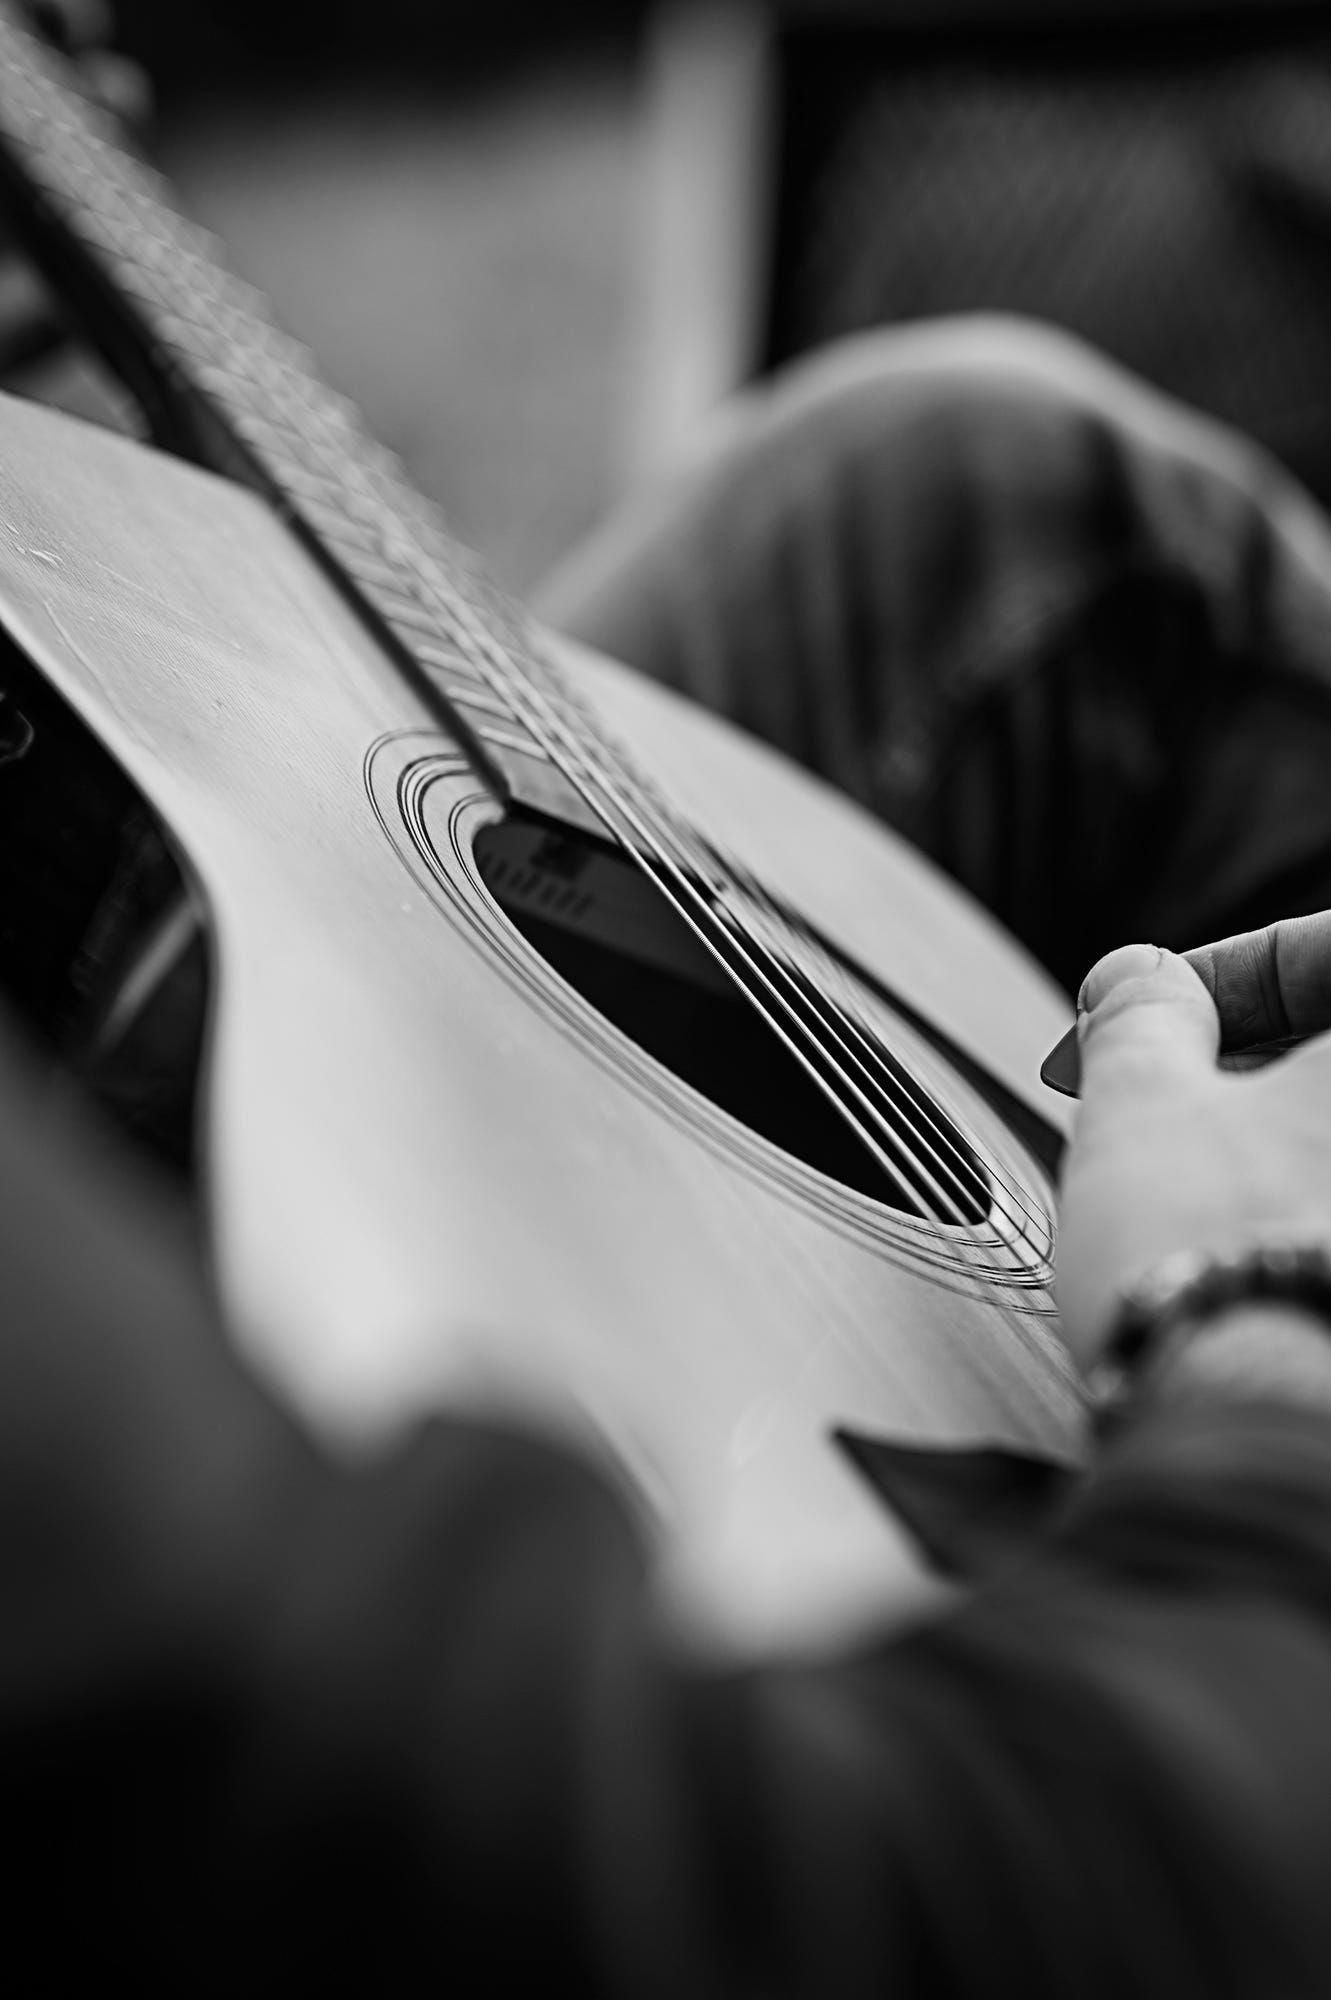 Beginner Learning Guitar Tips Learningguitartips Playguitarforbeginners Acoustic Guitar Photography Guitar Art Musician Photography